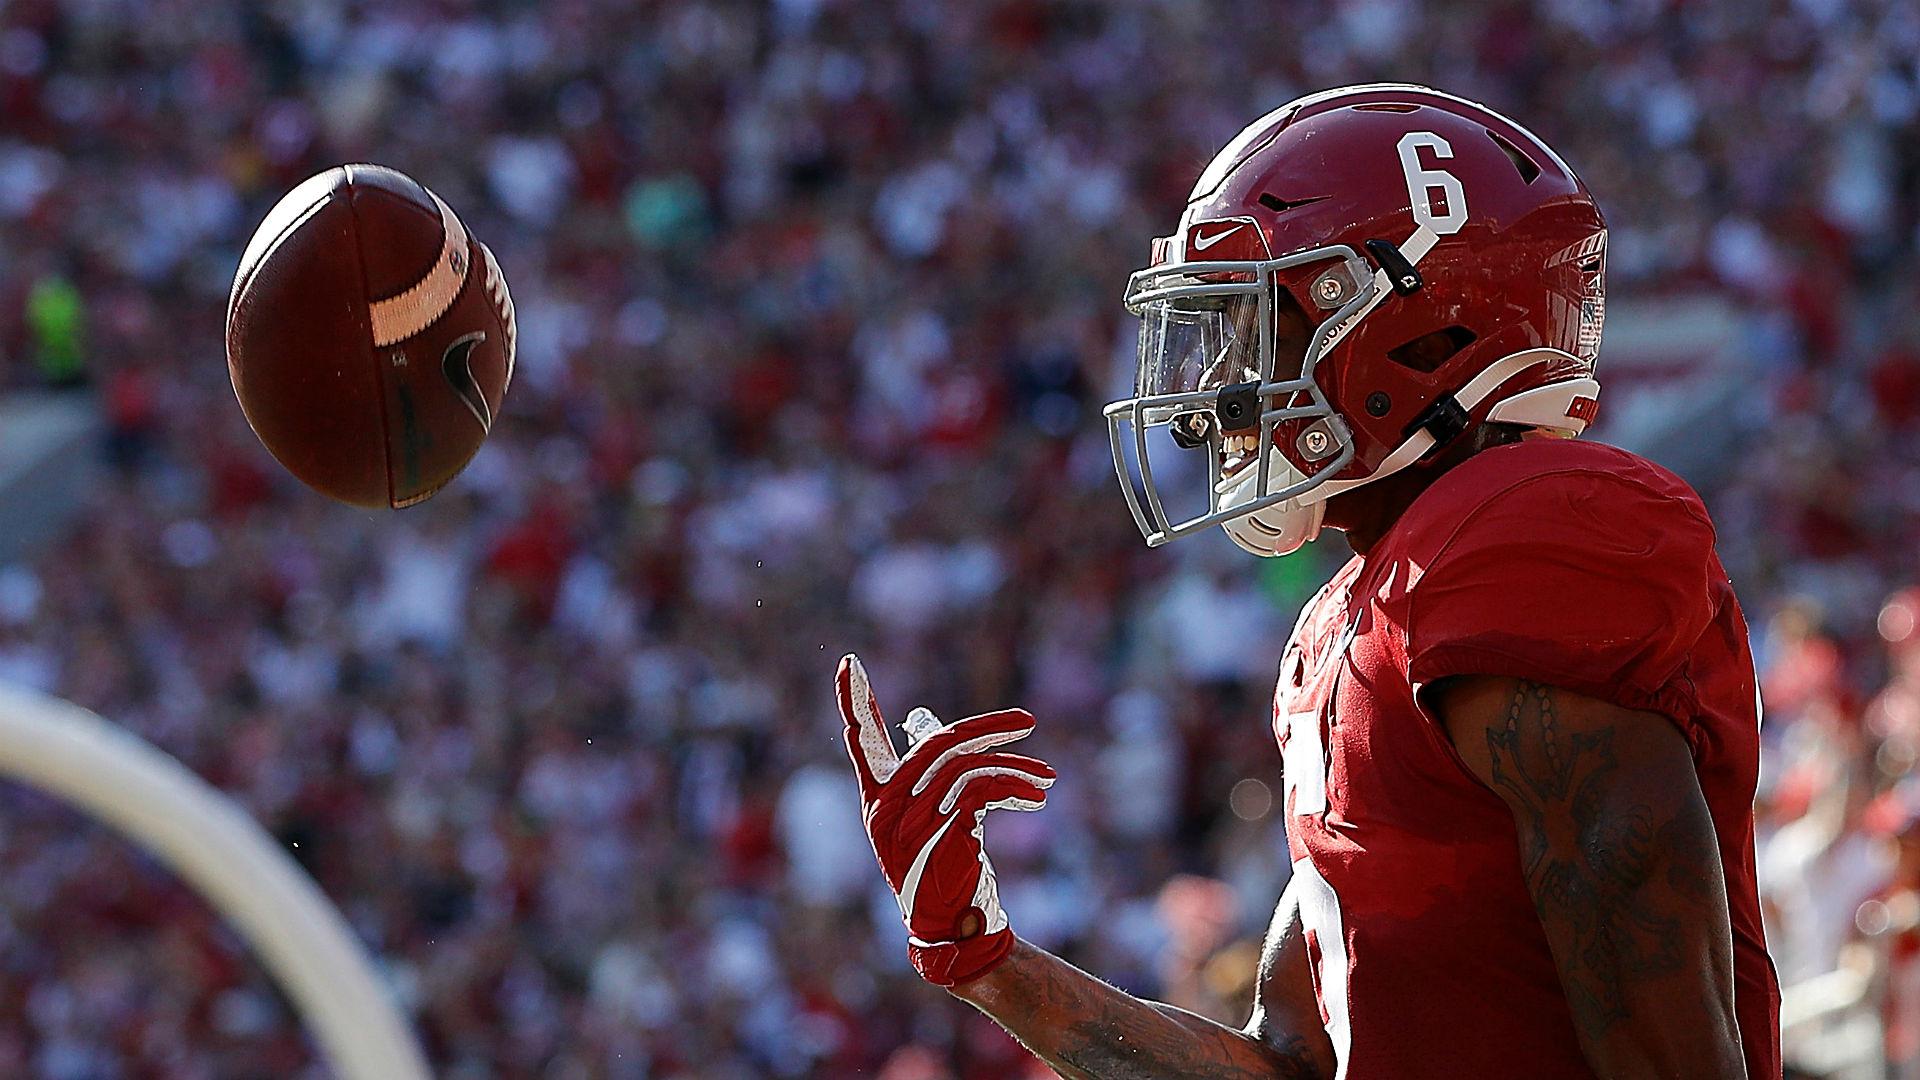 College football preseason polls: Comparing AP Top 25, Coaches Poll